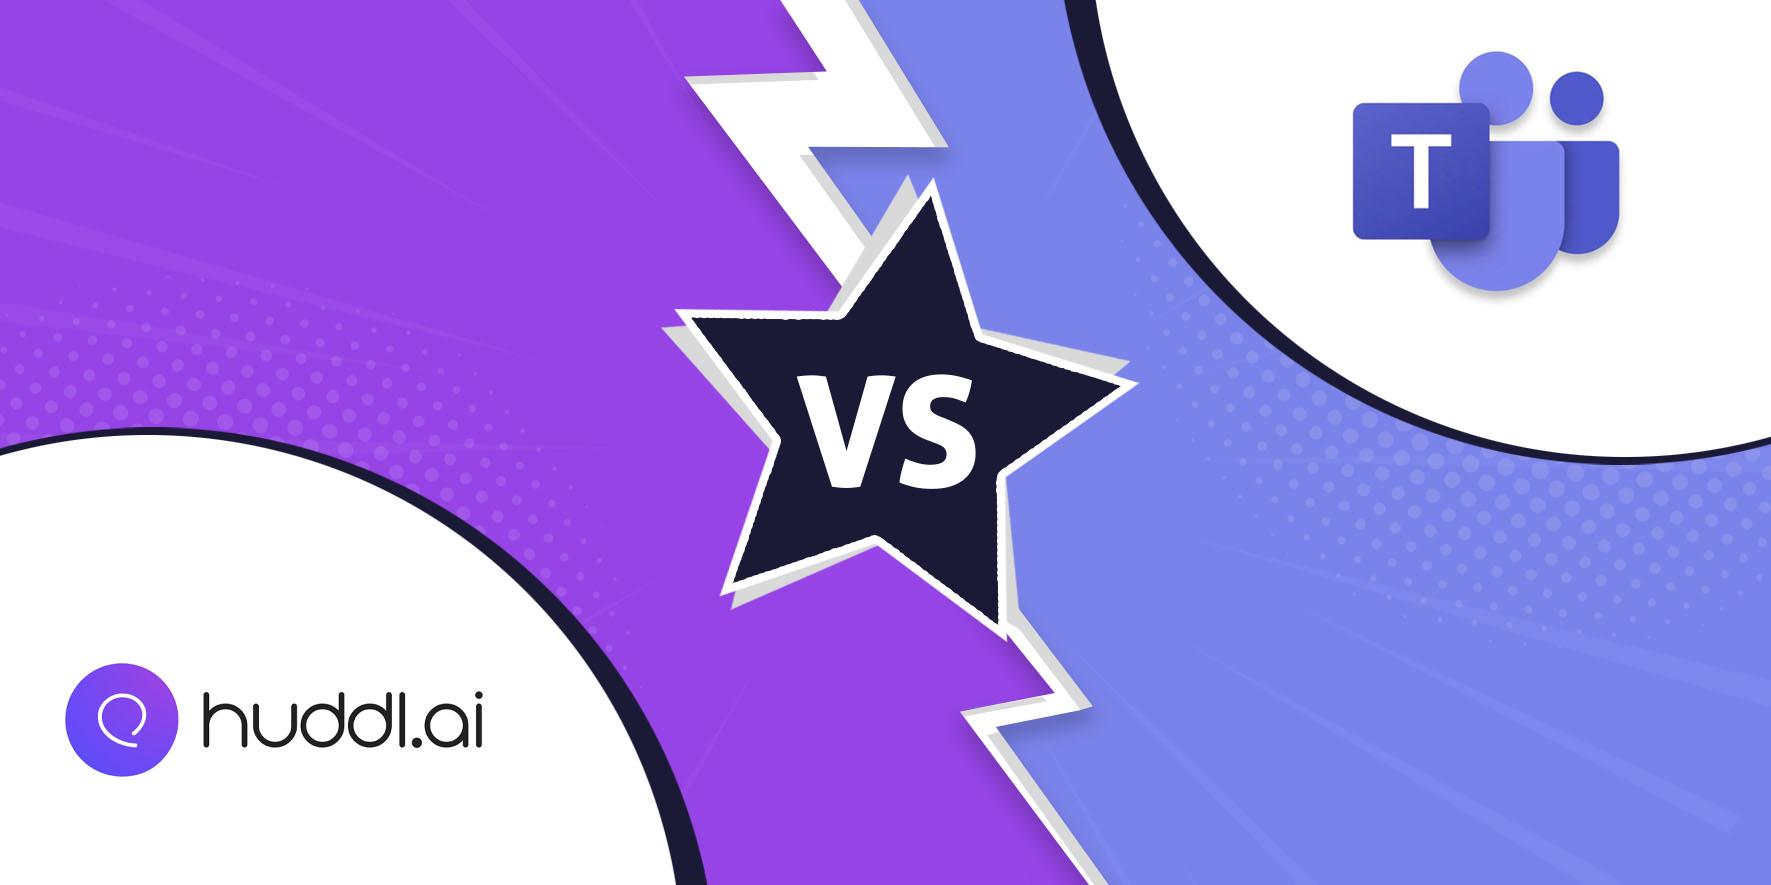 Huddl.ai vs Microsoft Teams: Take Your Pick